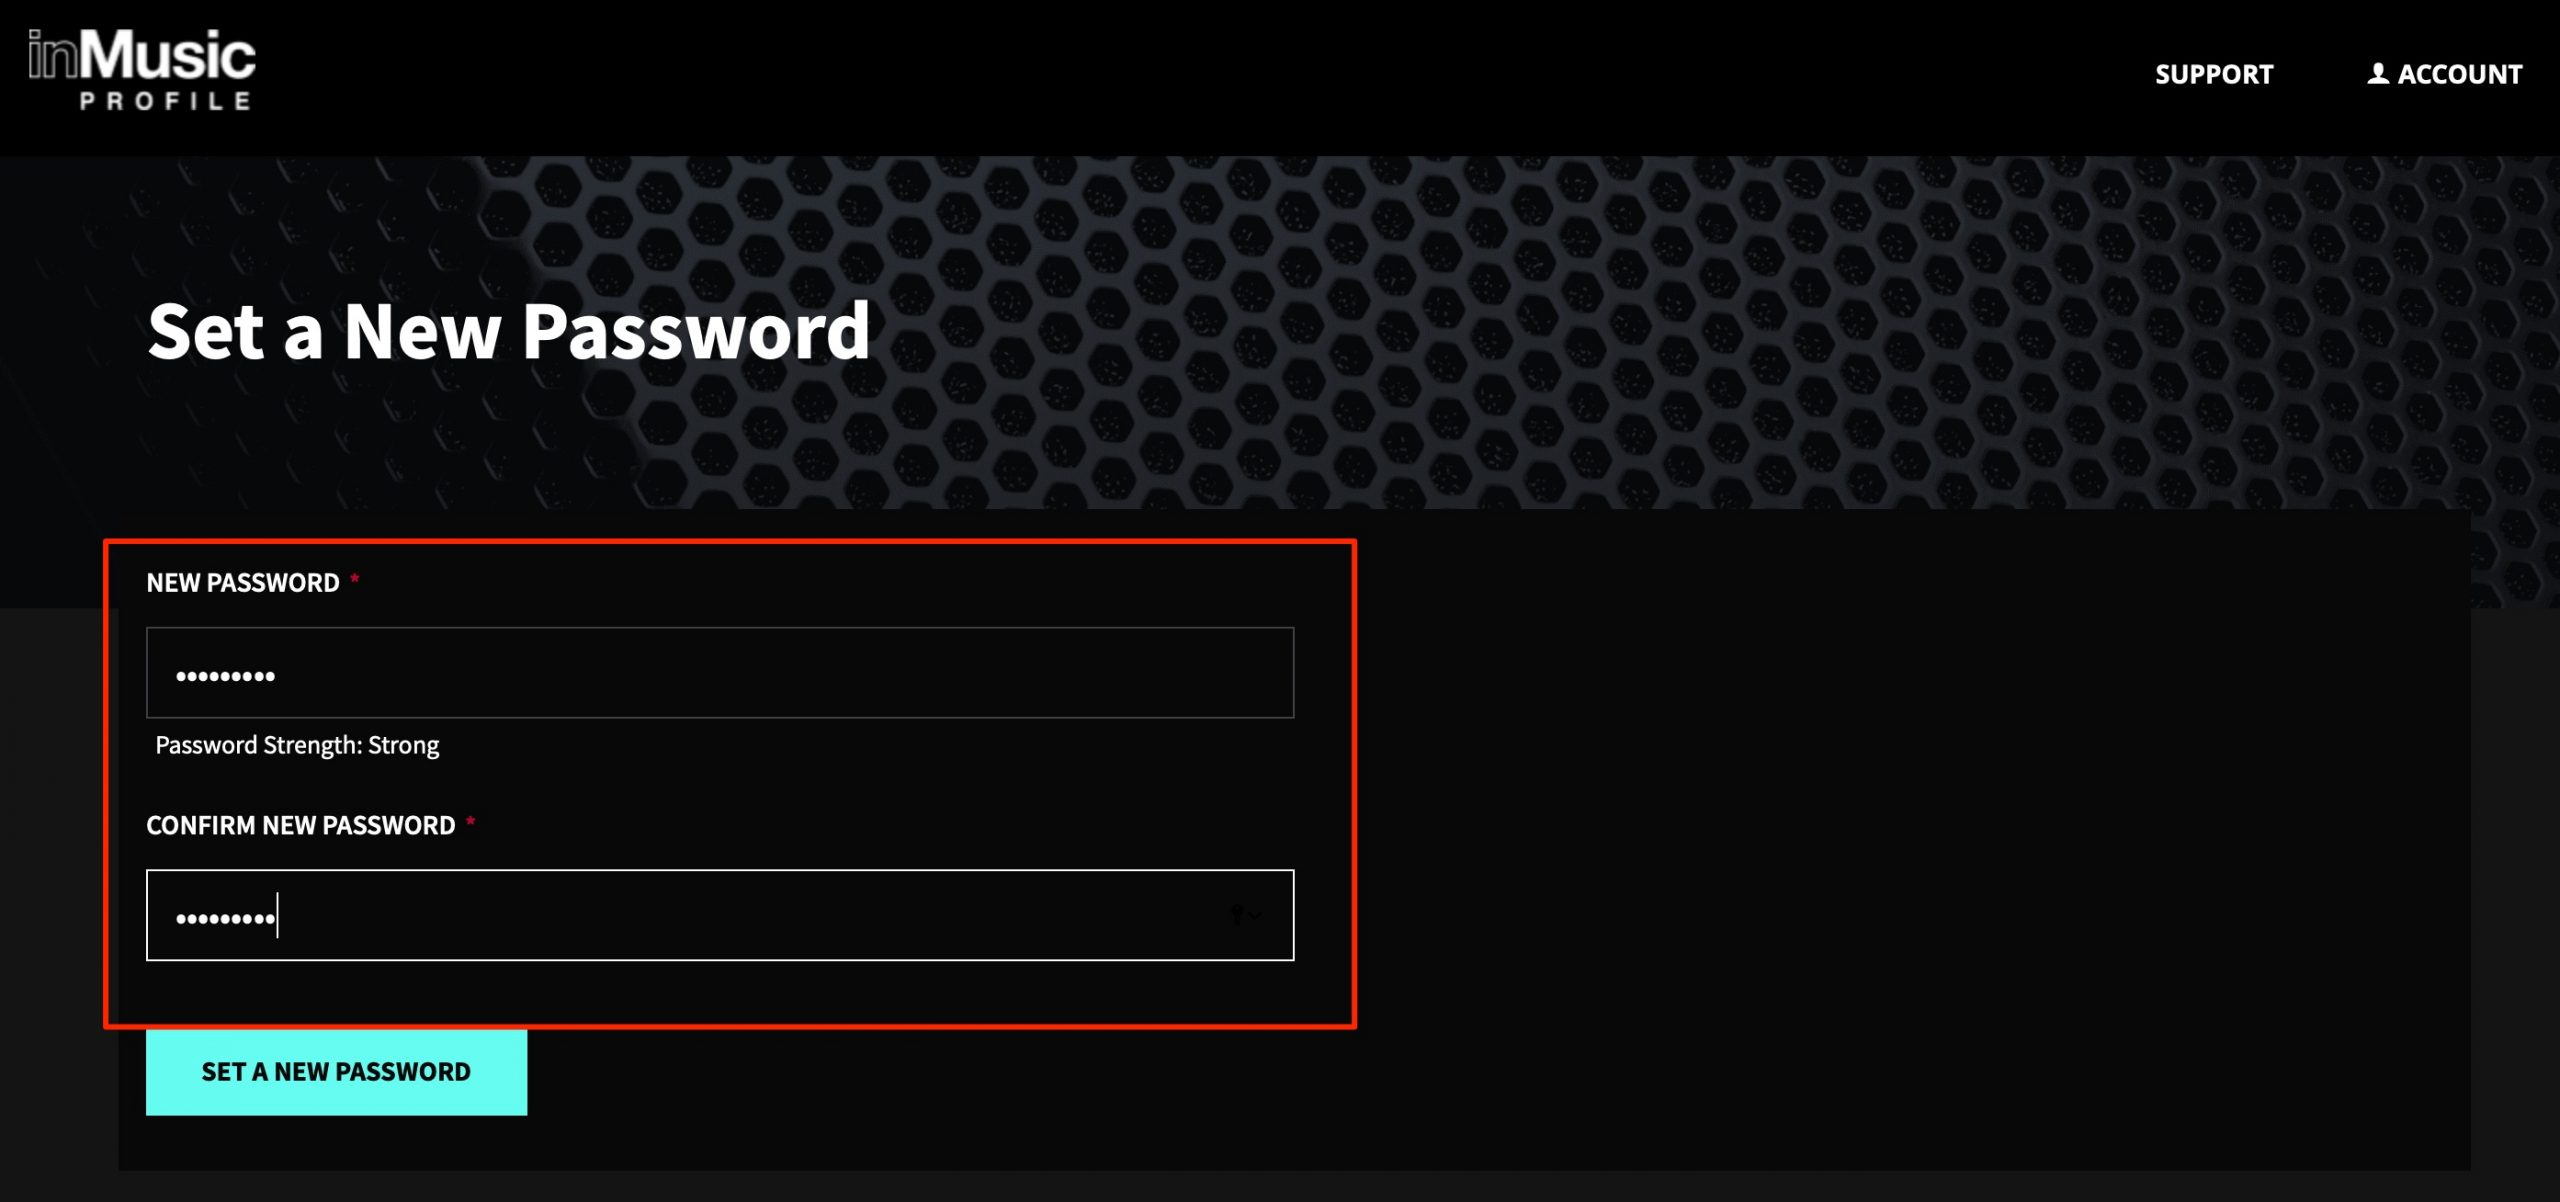 Set_a_New_Password